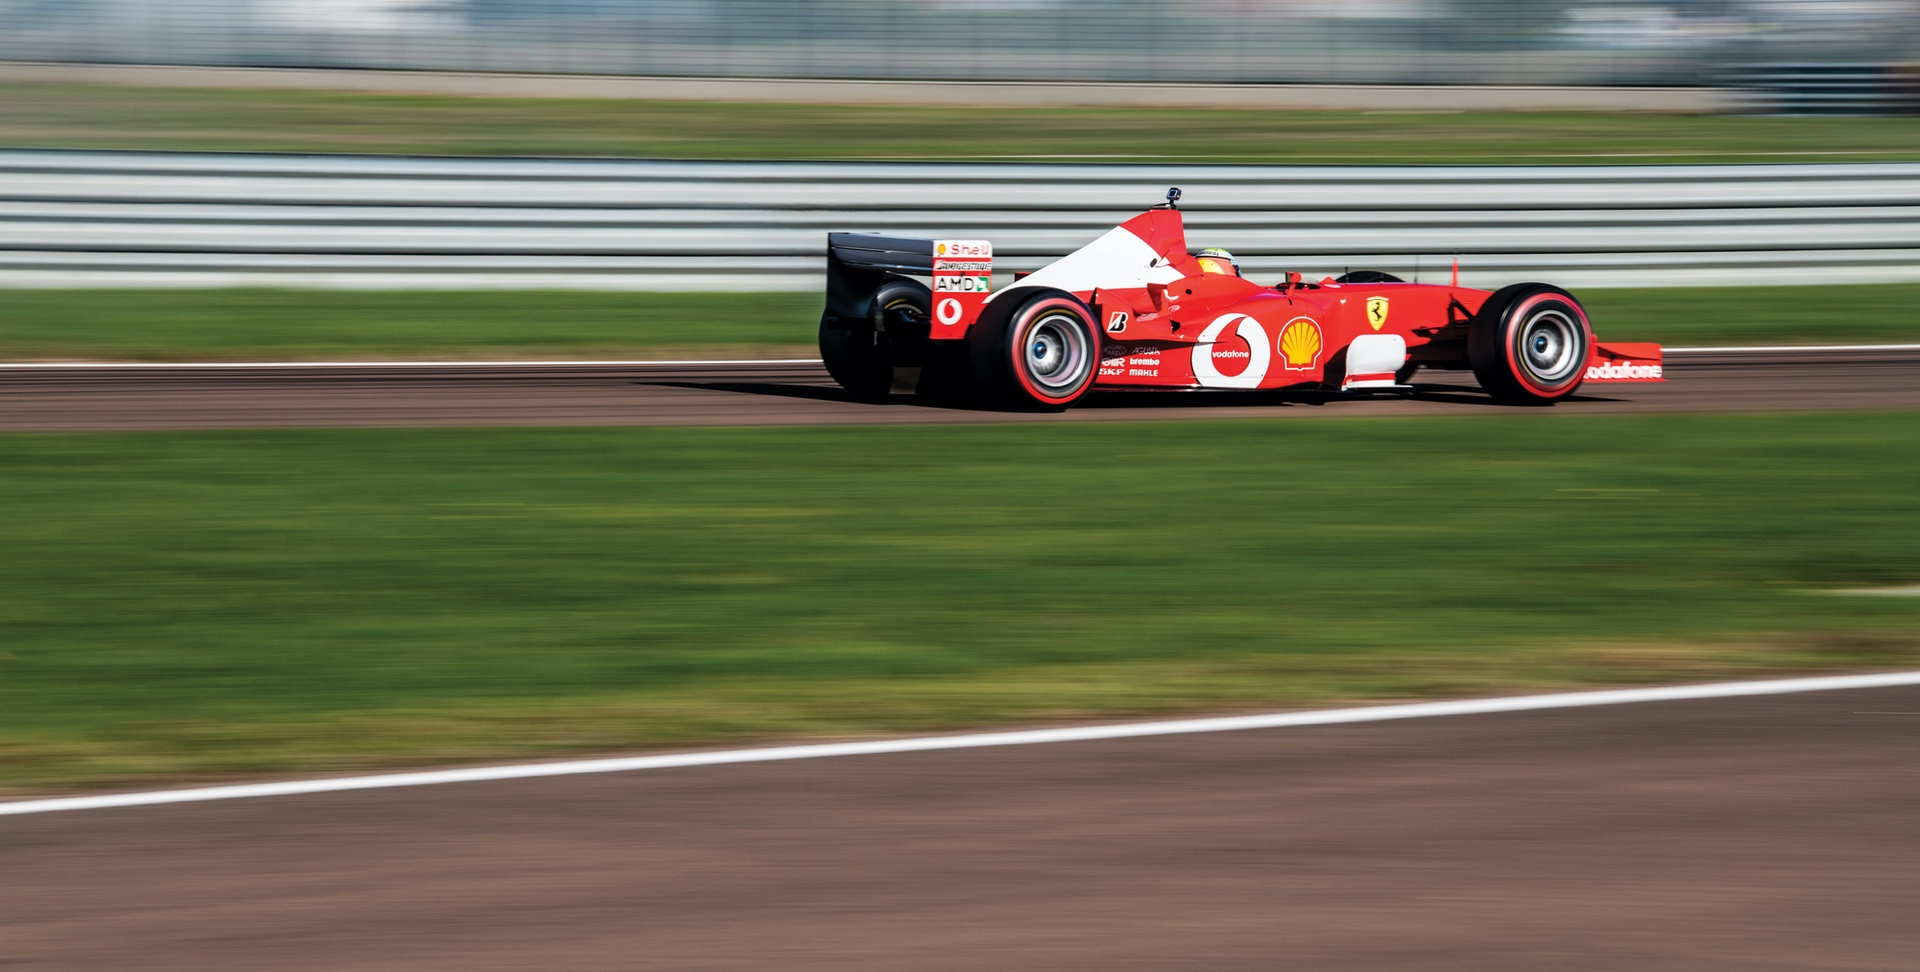 Mick_Schumacher_Ferrari_F2002_0001